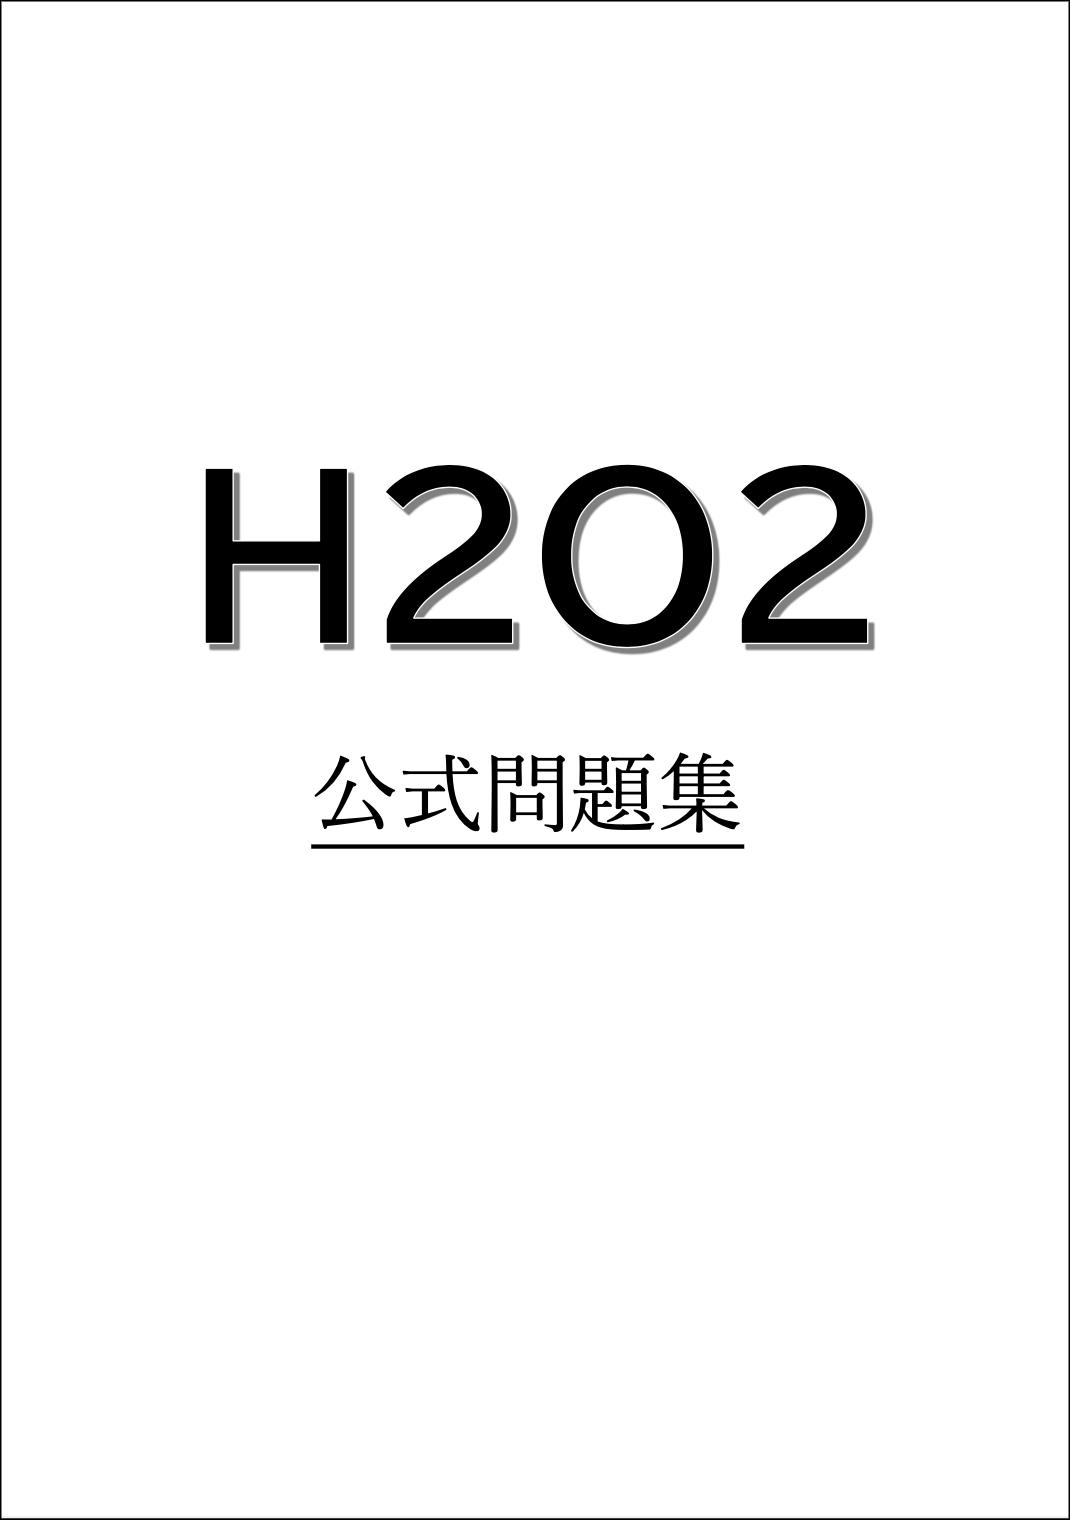 C33562142